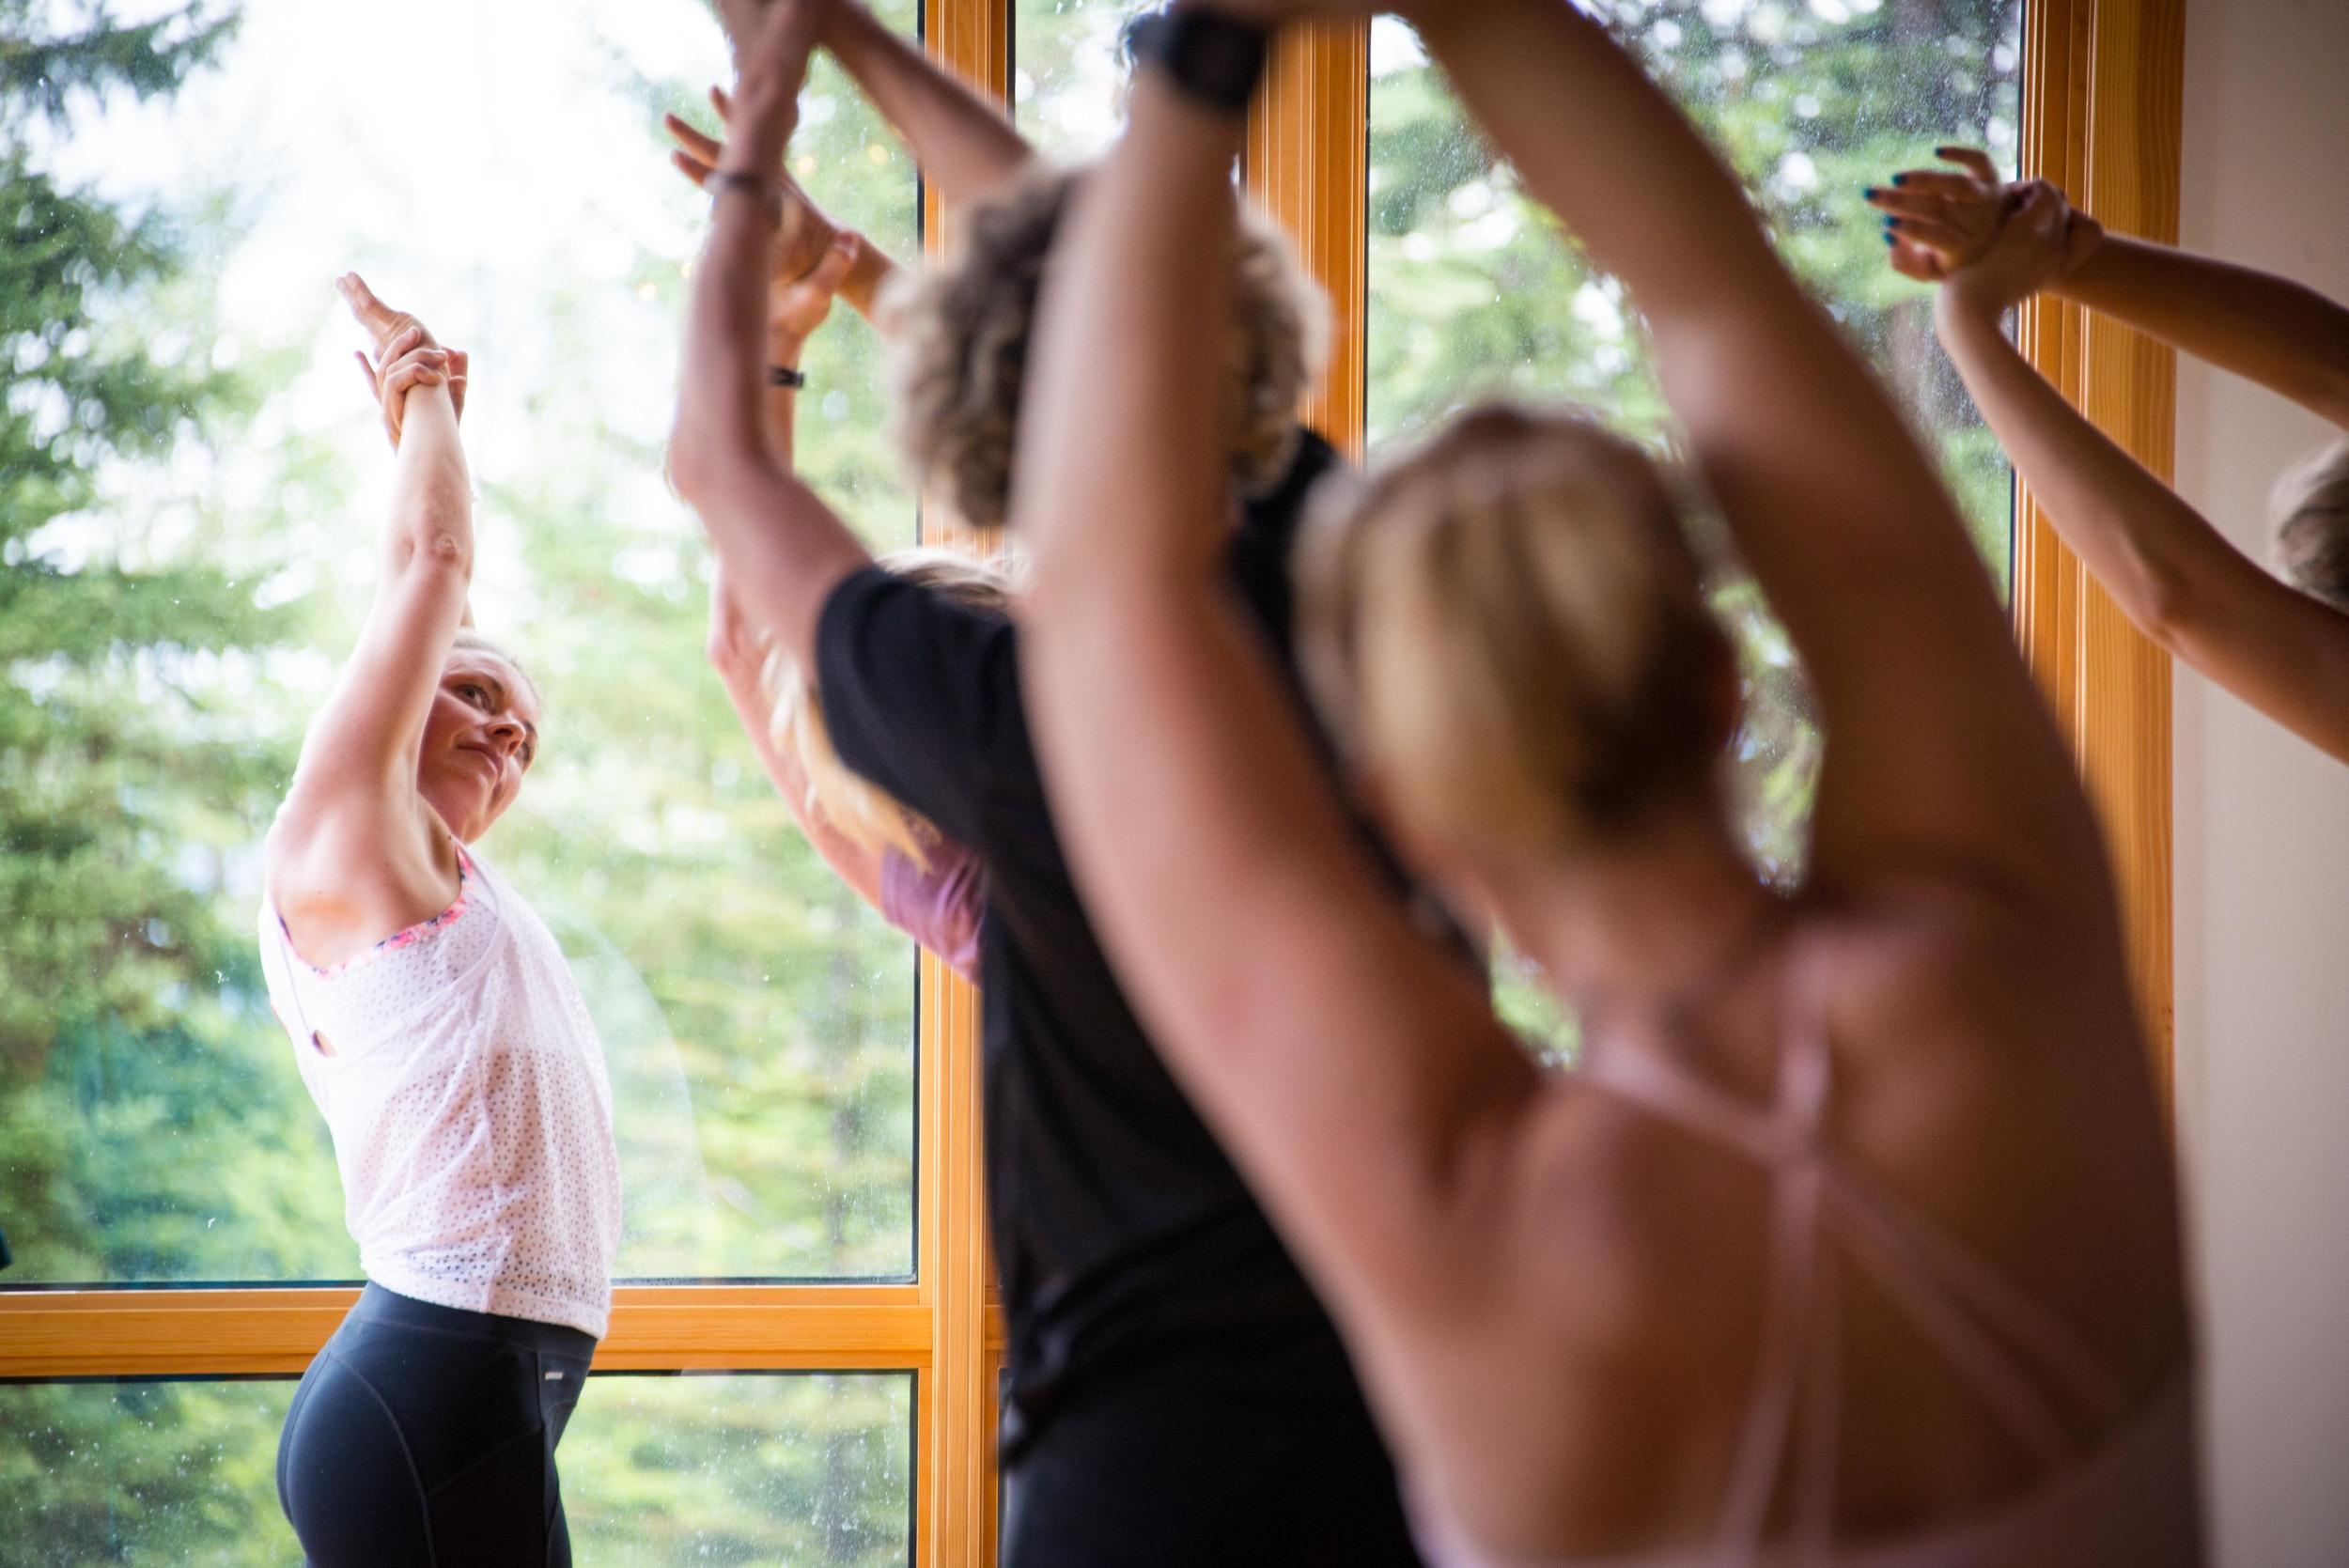 running-yoga-retreat-lush-acomadation-golden-emerald-lake-lodge-15.jpg